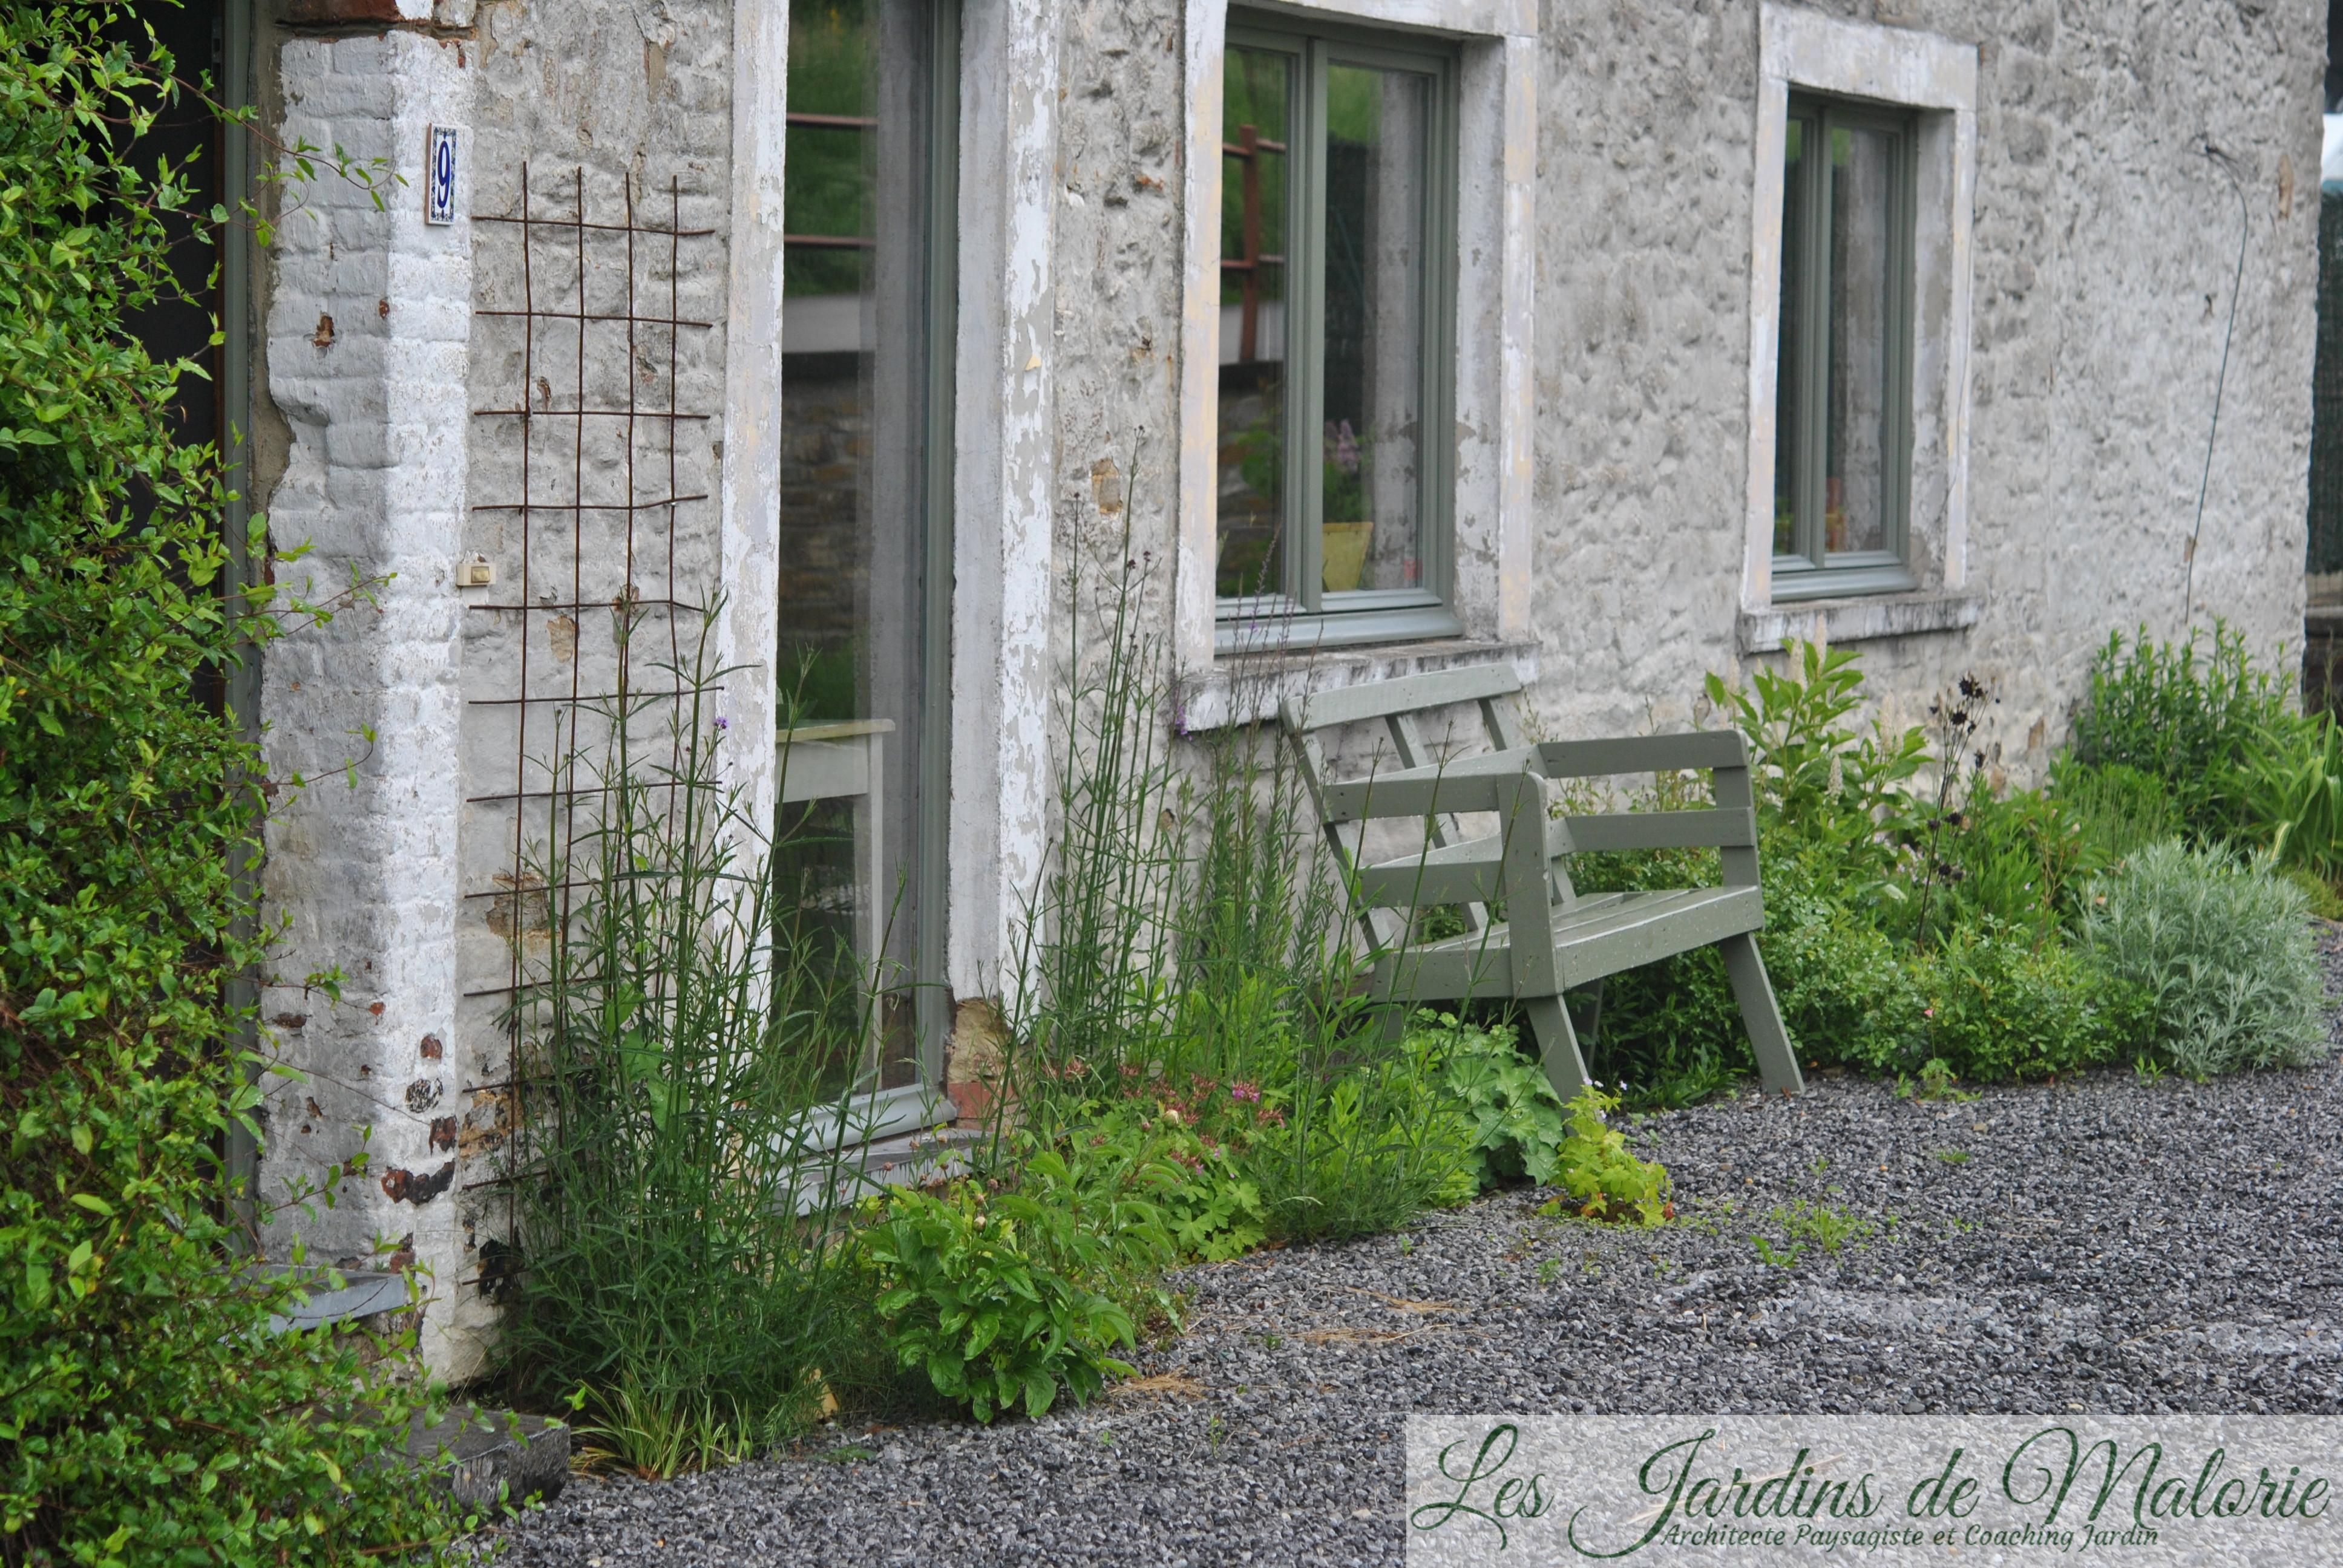 Arbuste Nain Persistant Plein Soleil coaching-jardin: jardin sec : plantations dans les graviers